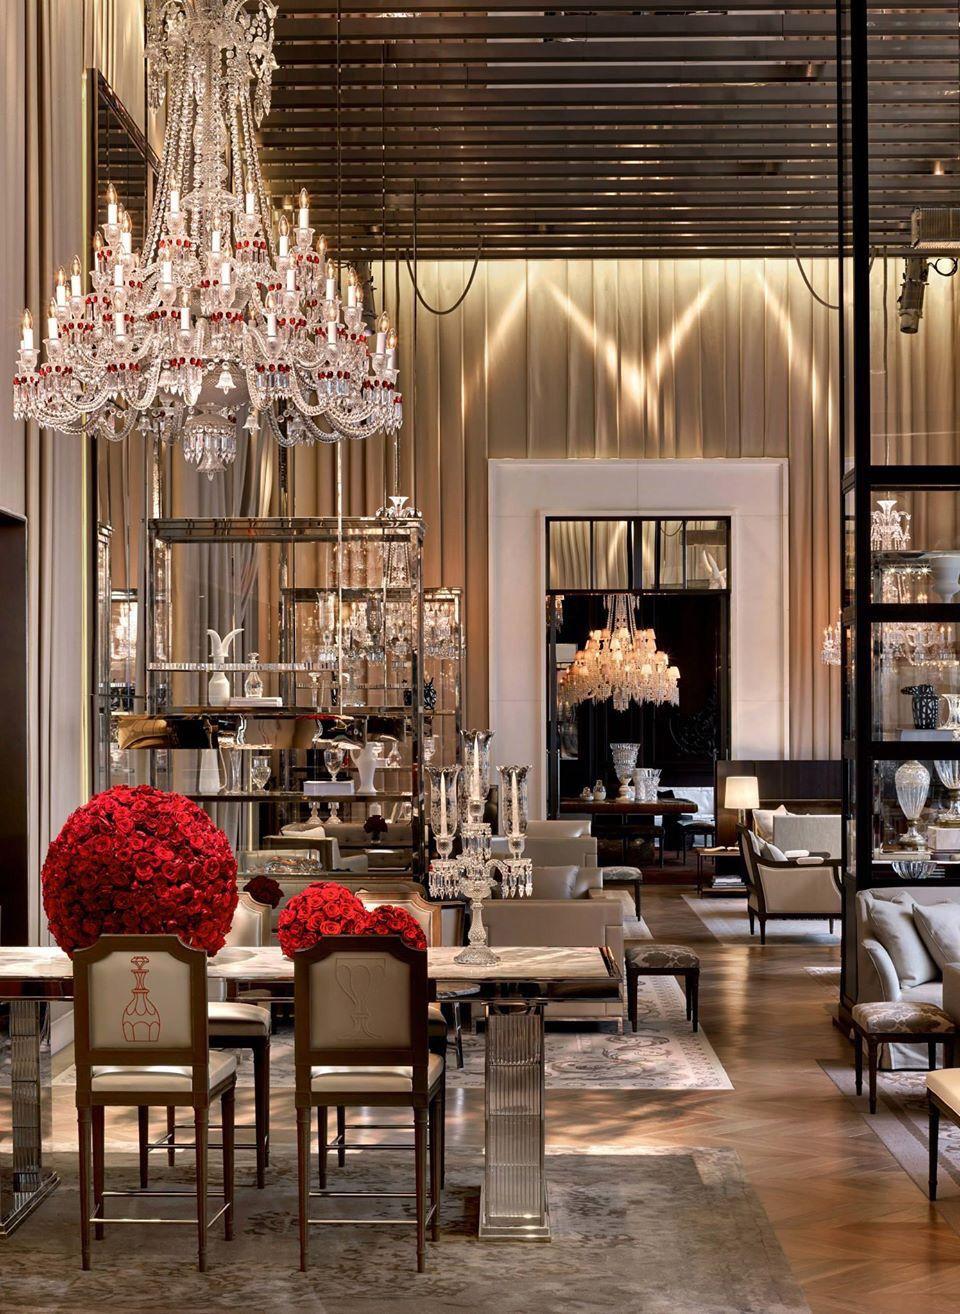 grand salon at the baccarat hotel new york h tels du monde hotel decor hotel interiors. Black Bedroom Furniture Sets. Home Design Ideas